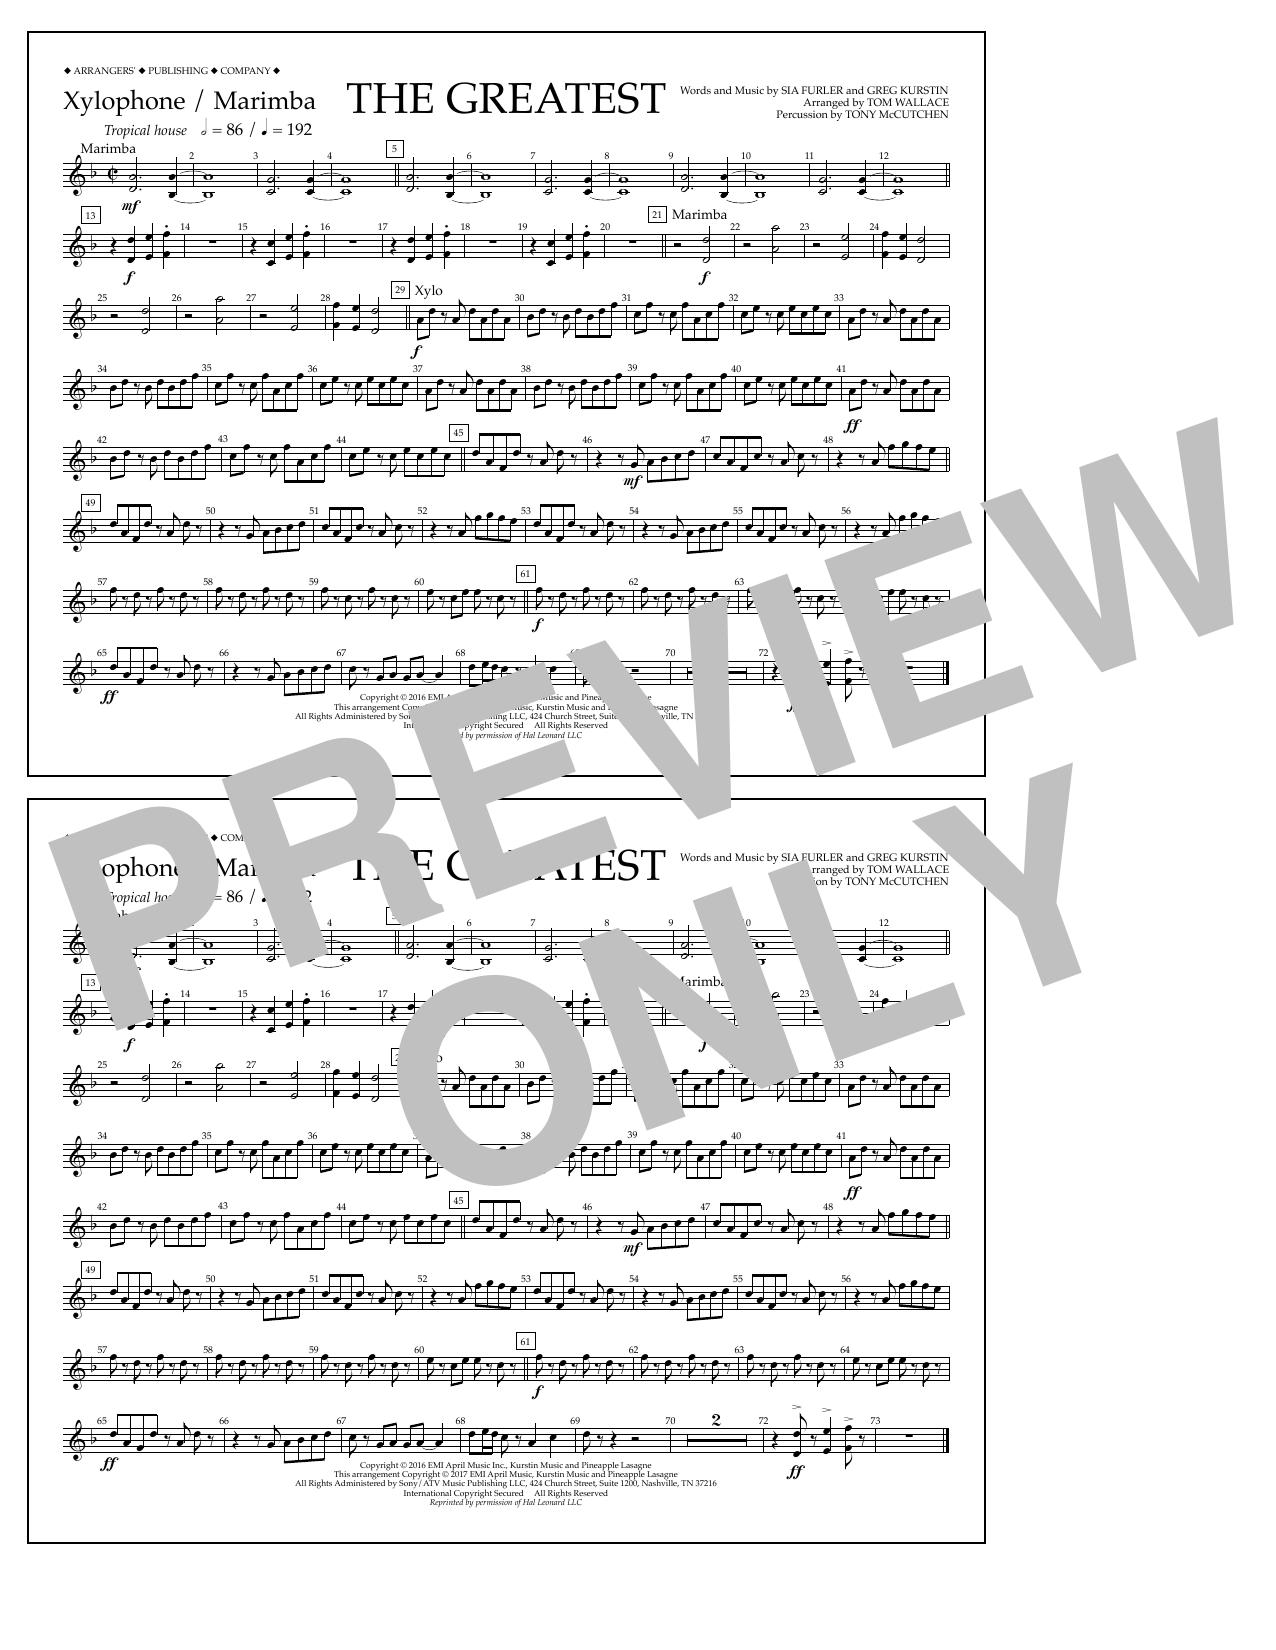 The Greatest - Xylophone/Marimba Sheet Music